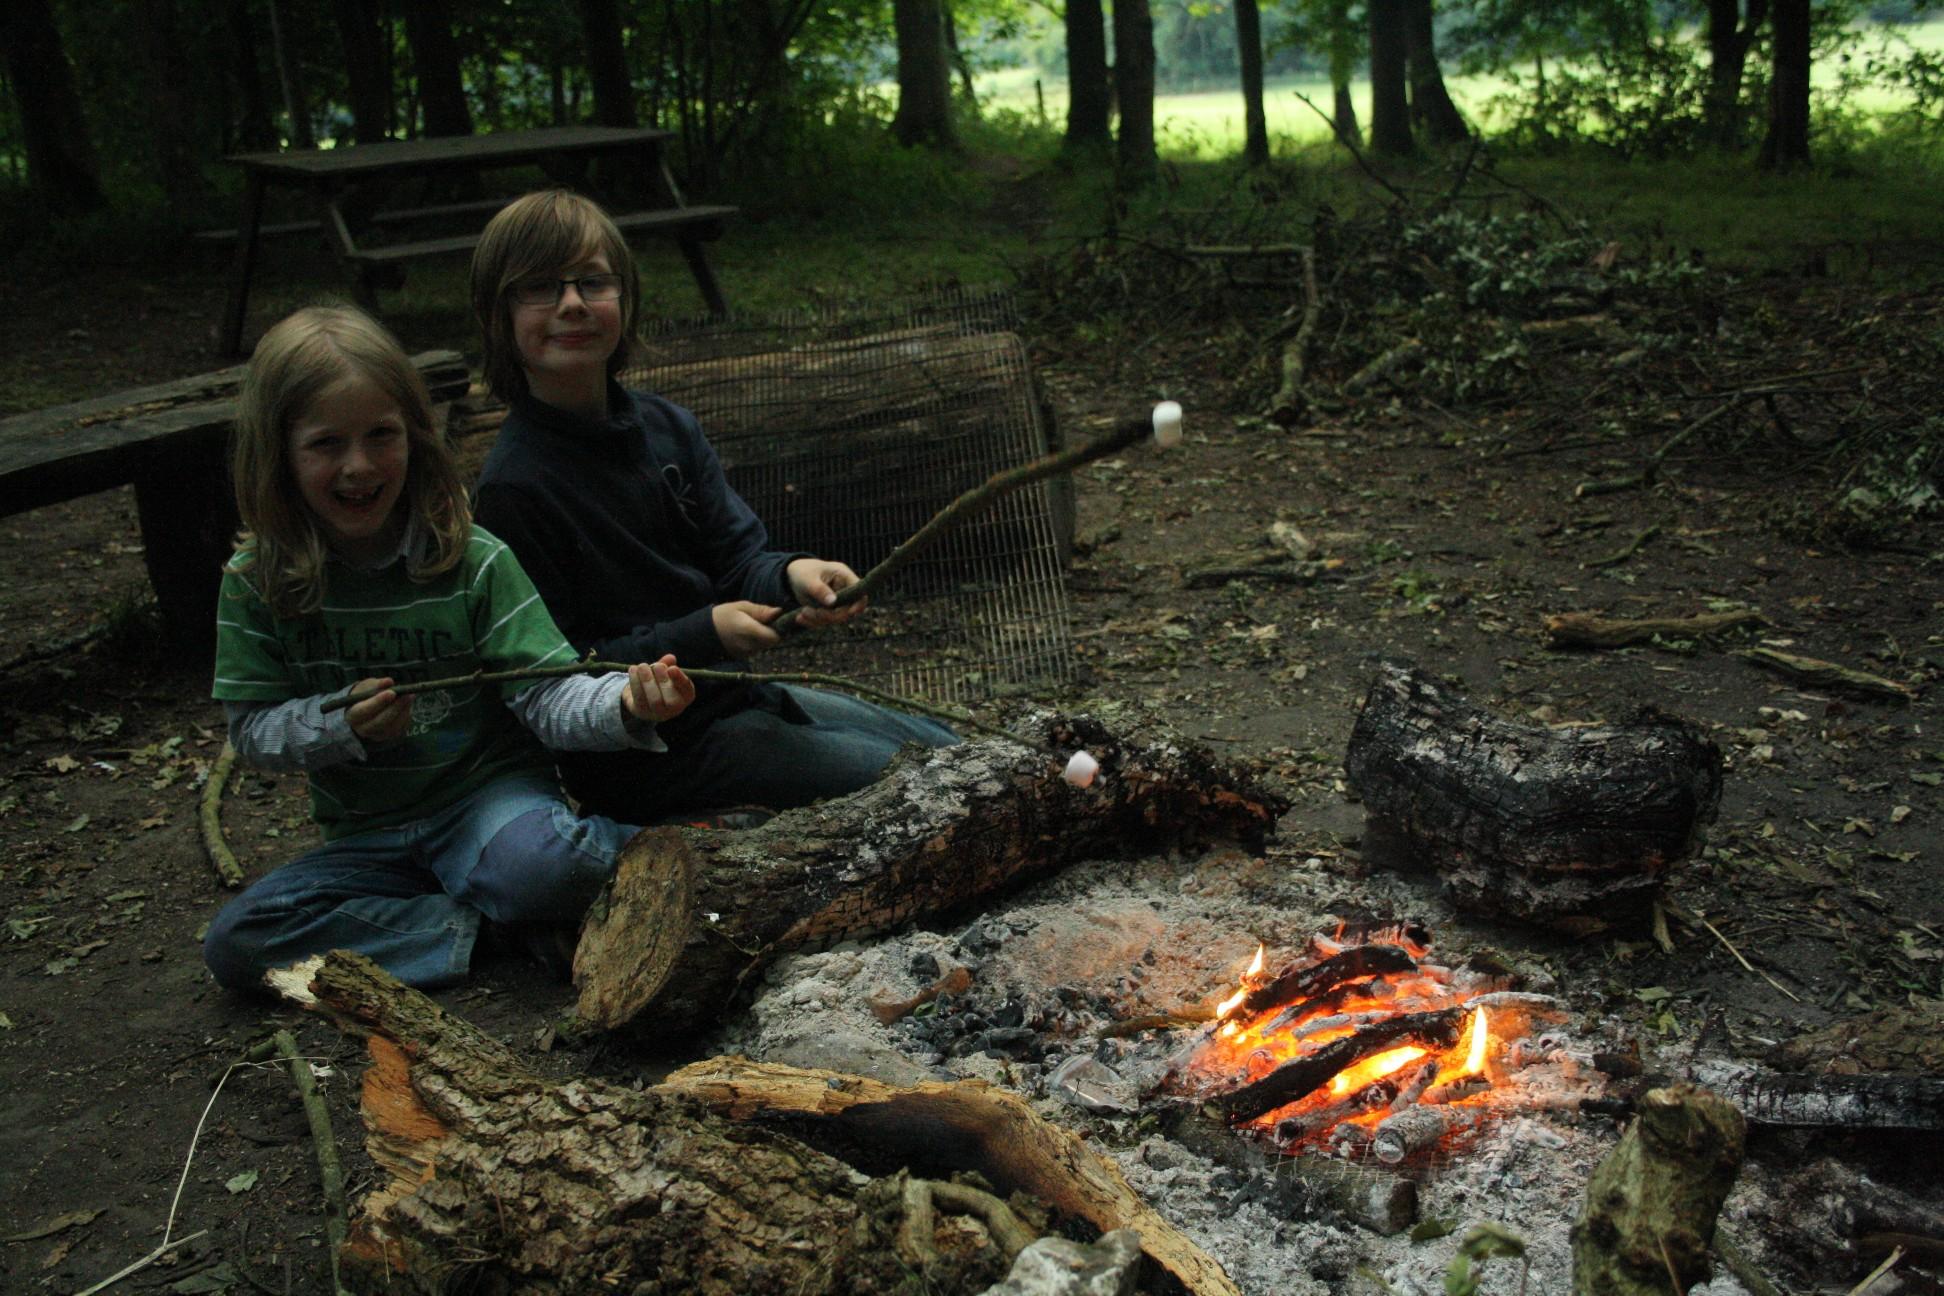 Marshmellows über dem Feuer rösten - unsere Jungs sind bescheiden.